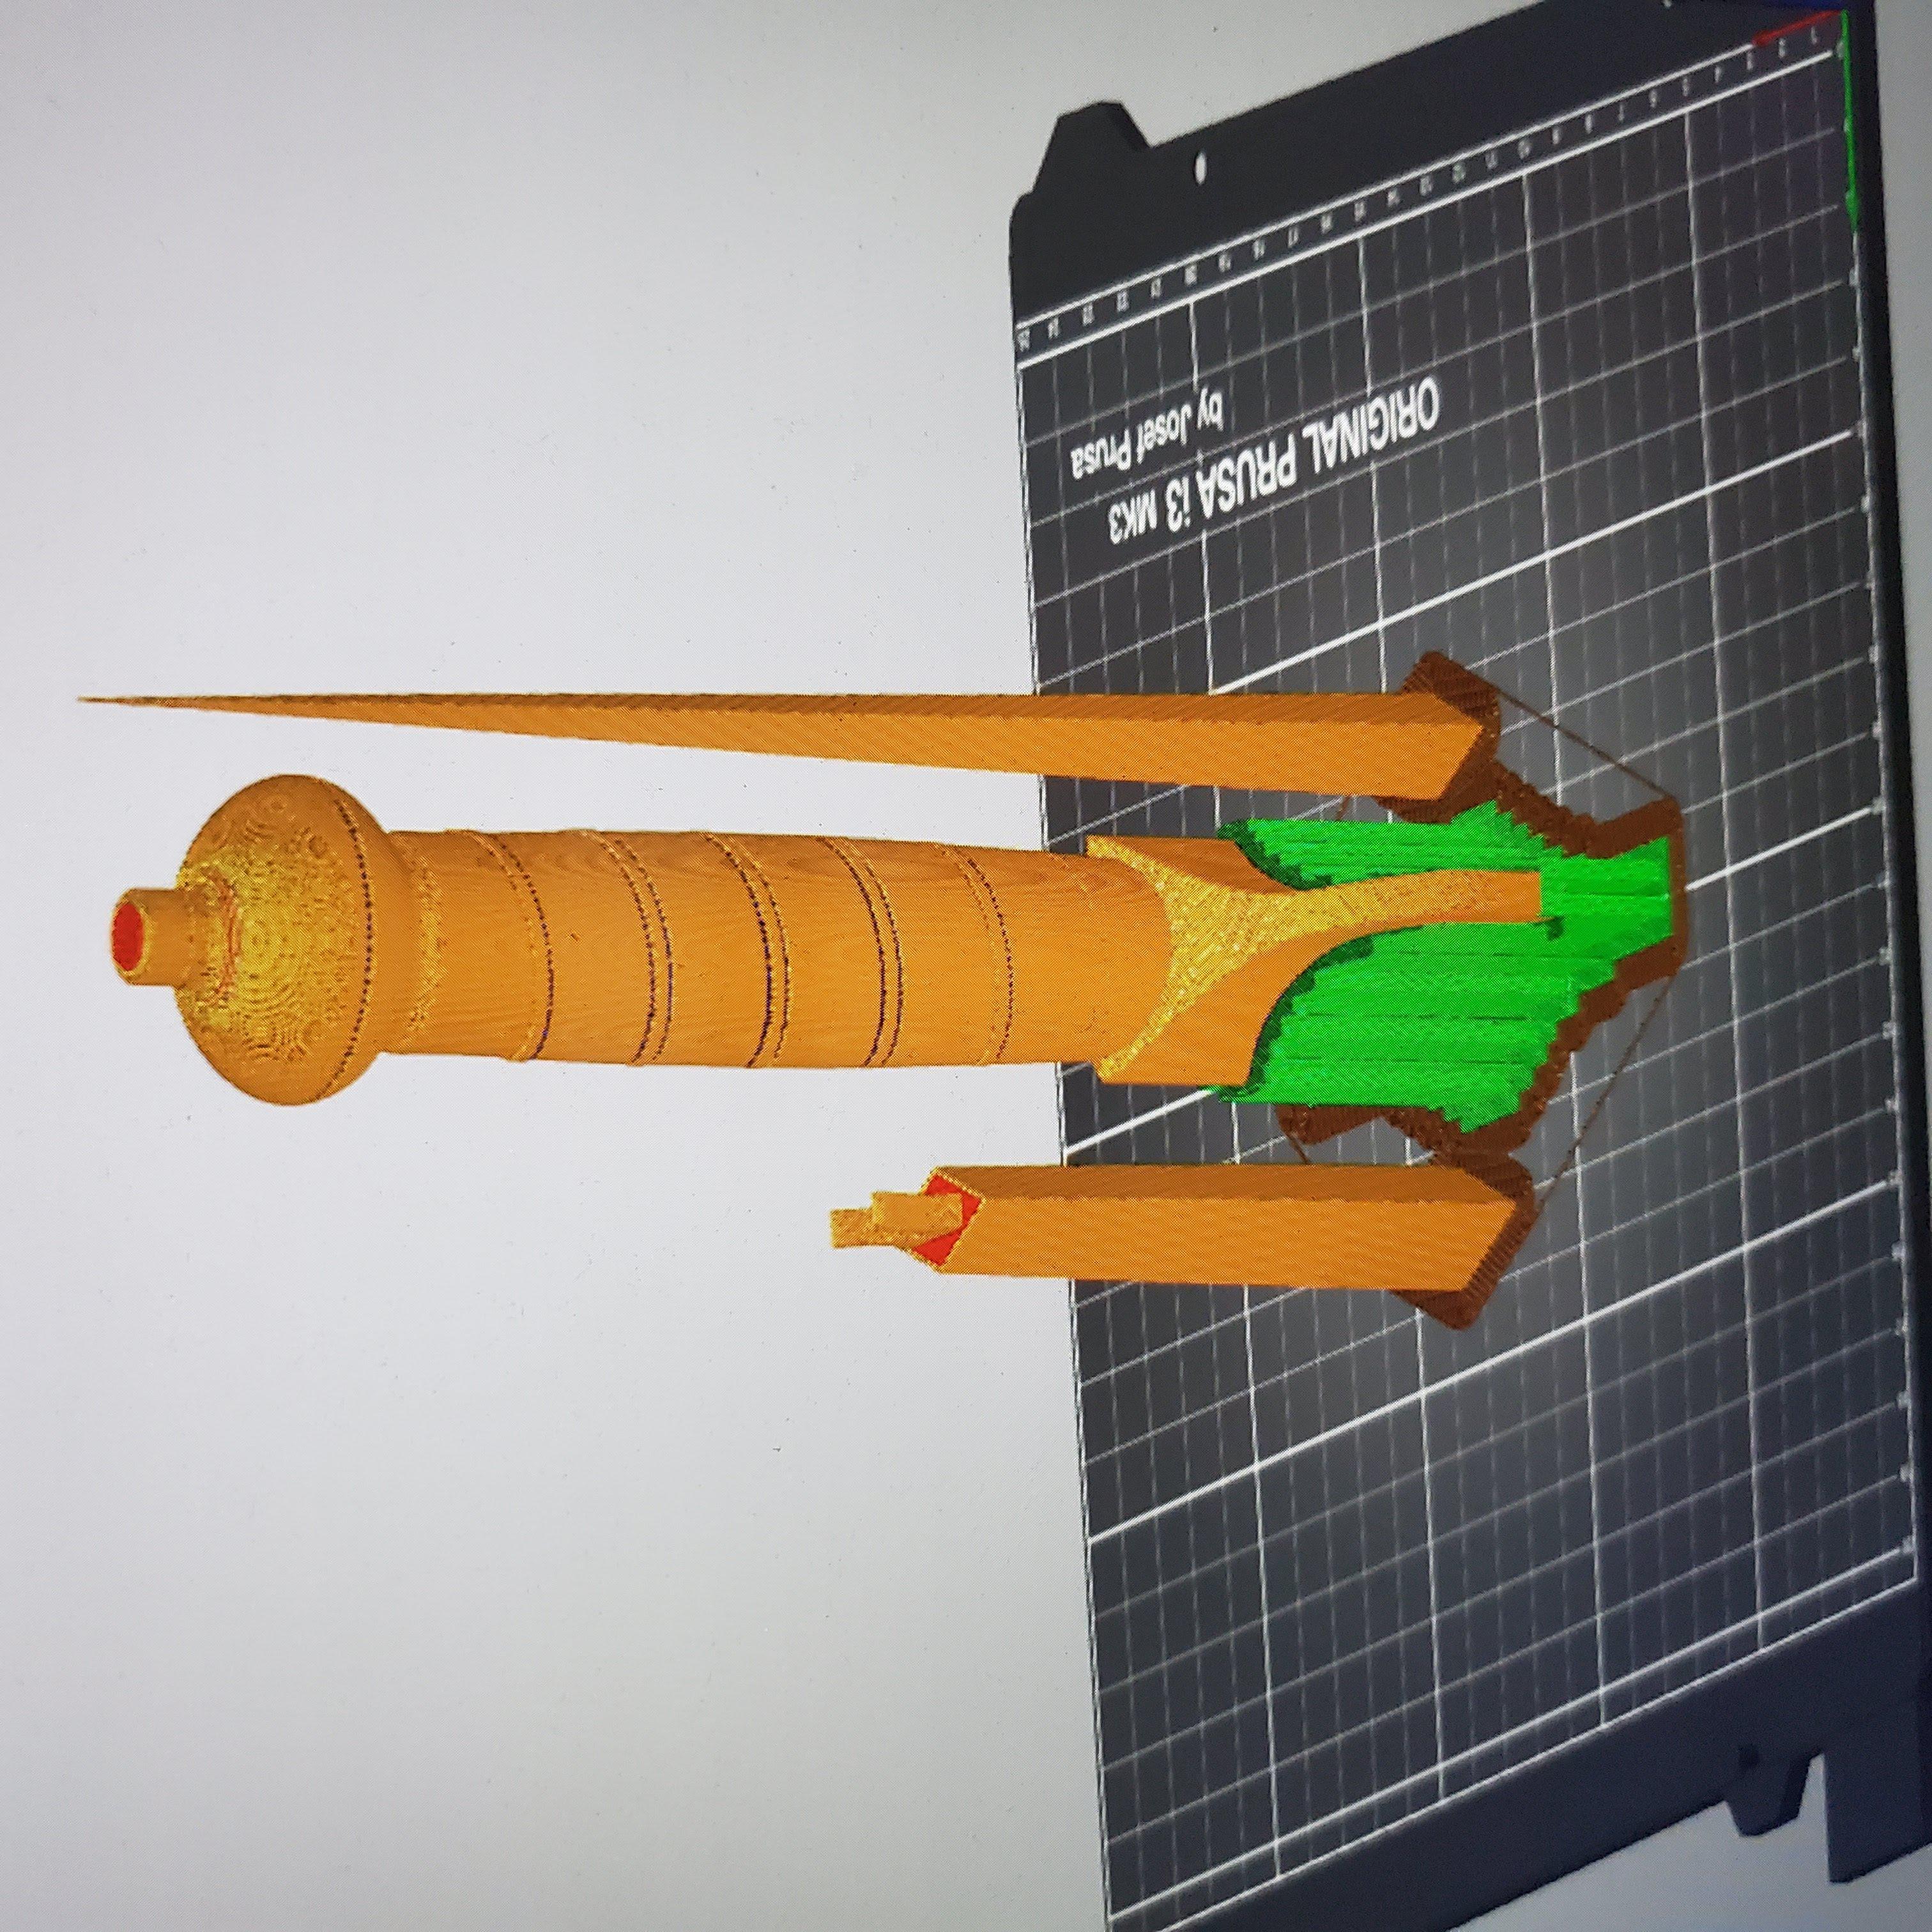 20190907_020614.jpg Download free STL file V for Vendetta Dagger New and Improved • 3D printer model, stensethjeremy